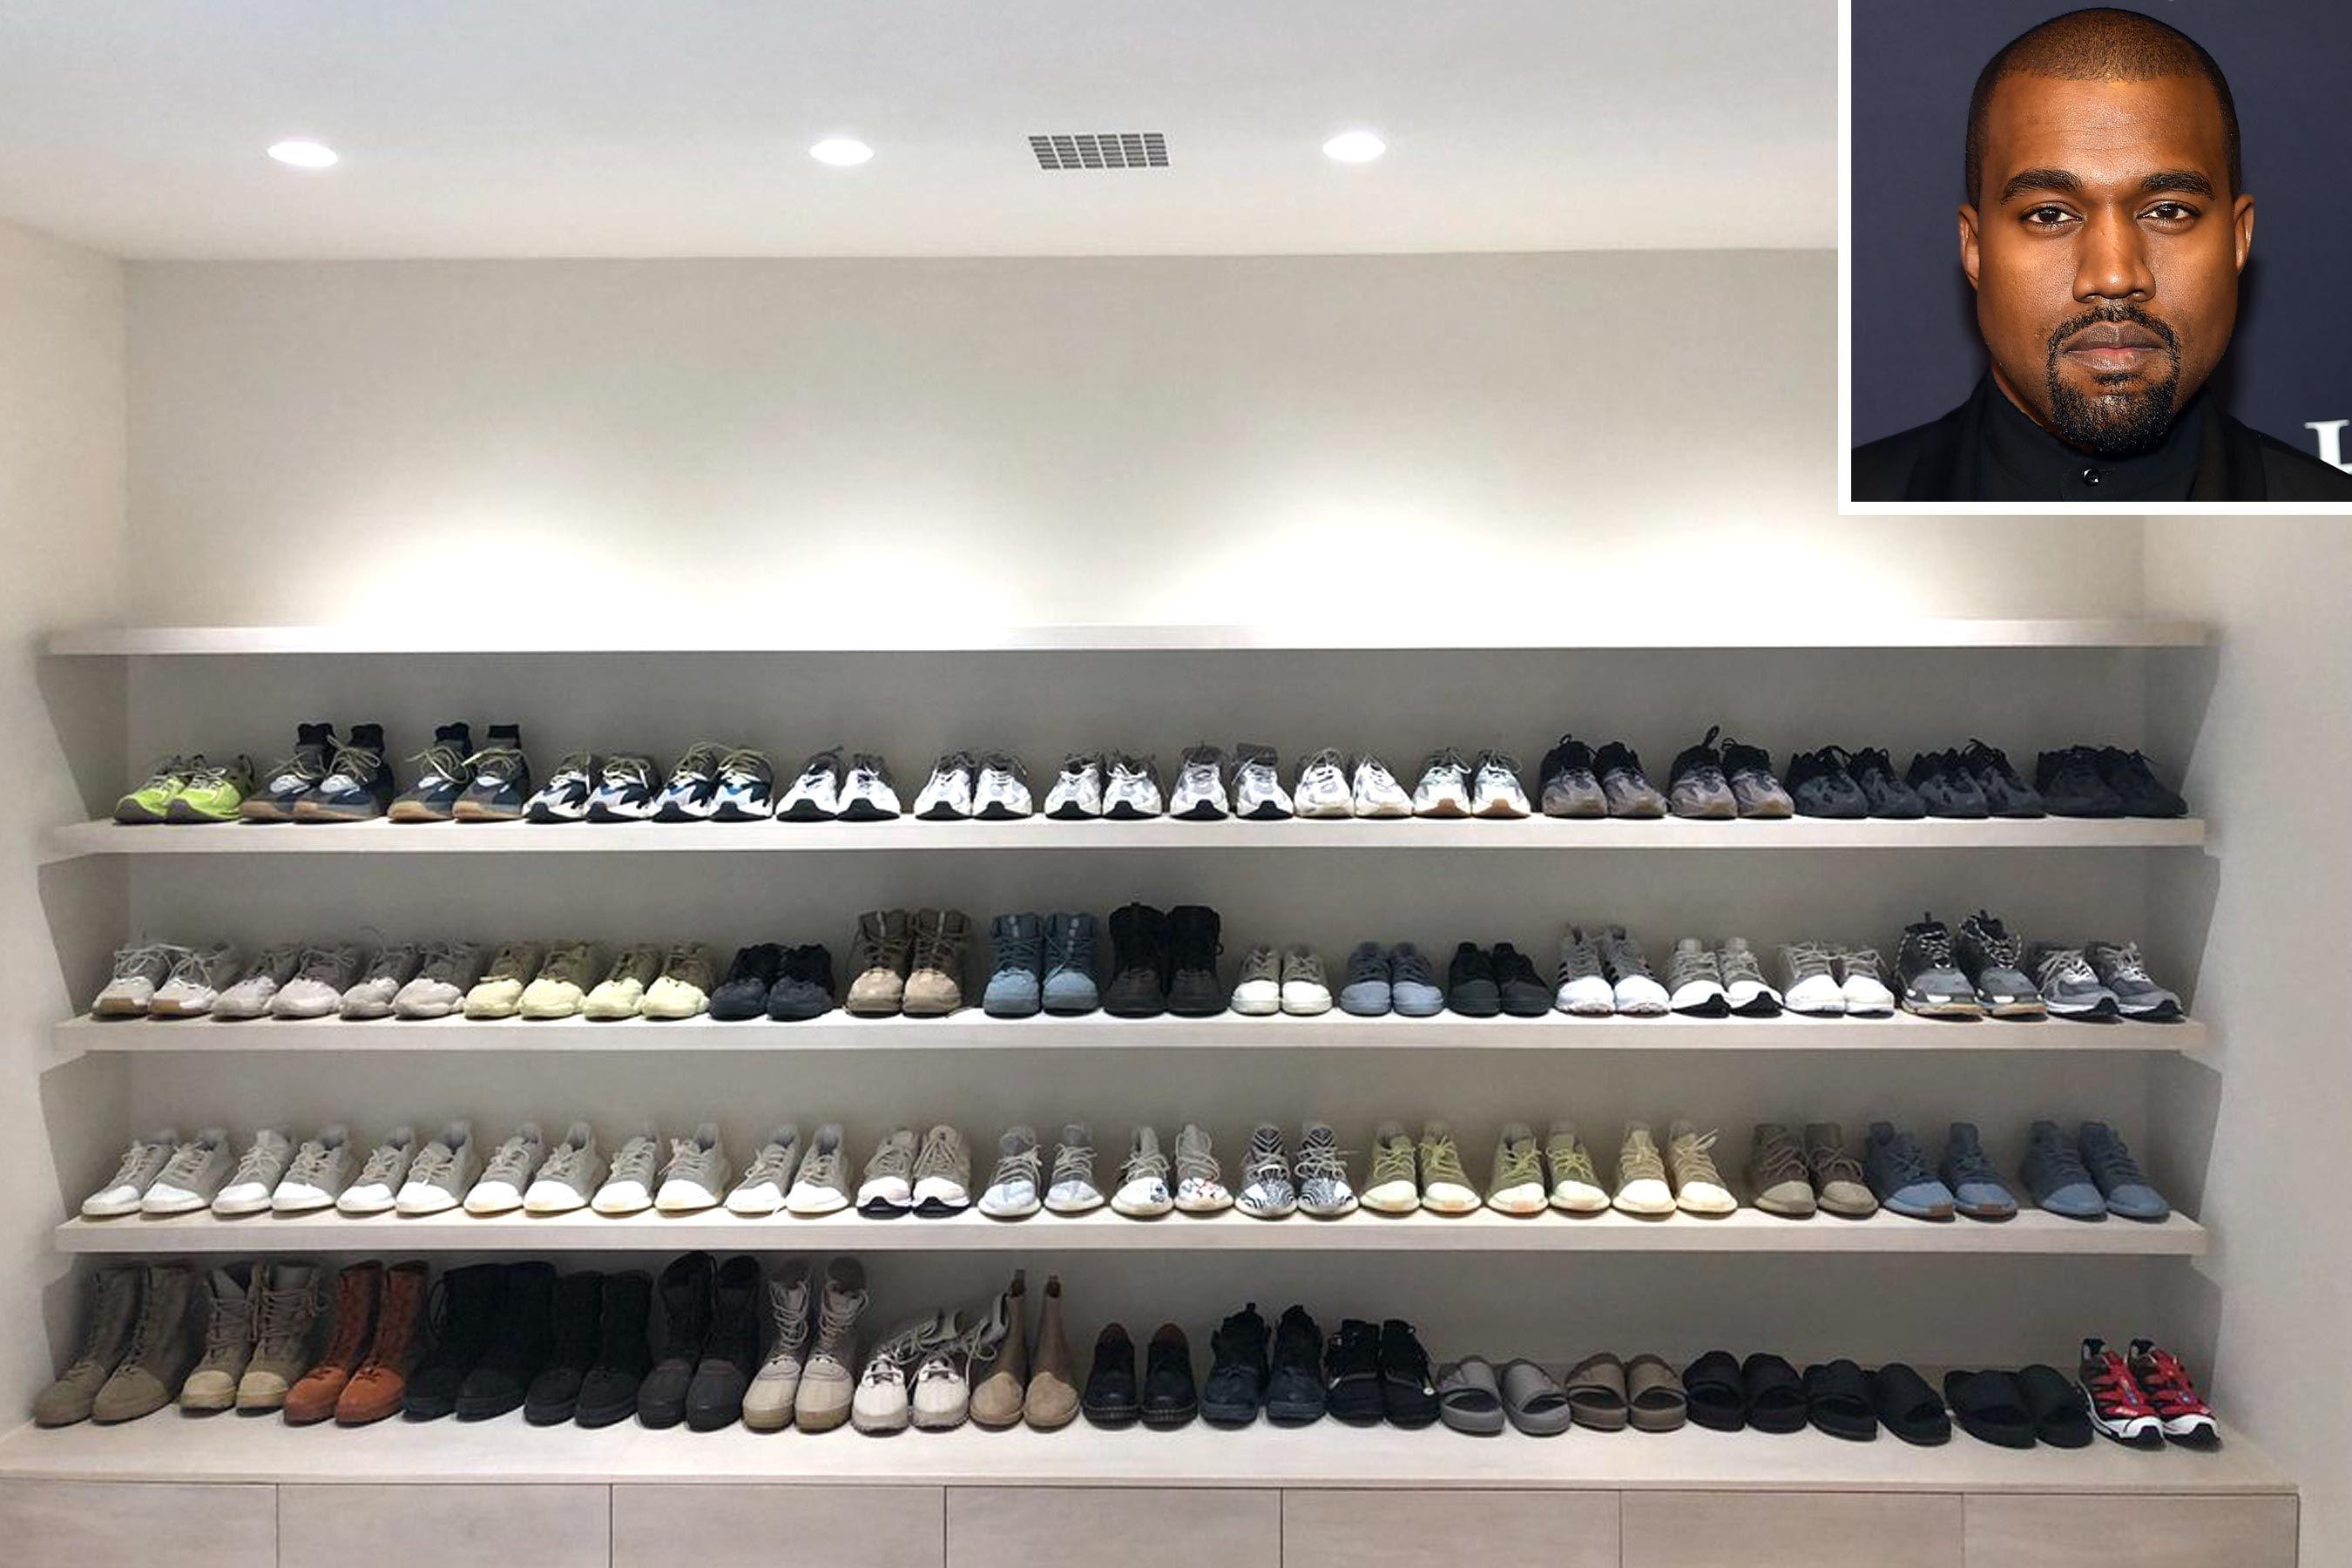 Kanye West Shares A Rare Look Inside His Epic Shoe Closet Kanye West Kim Kardashian Kanye